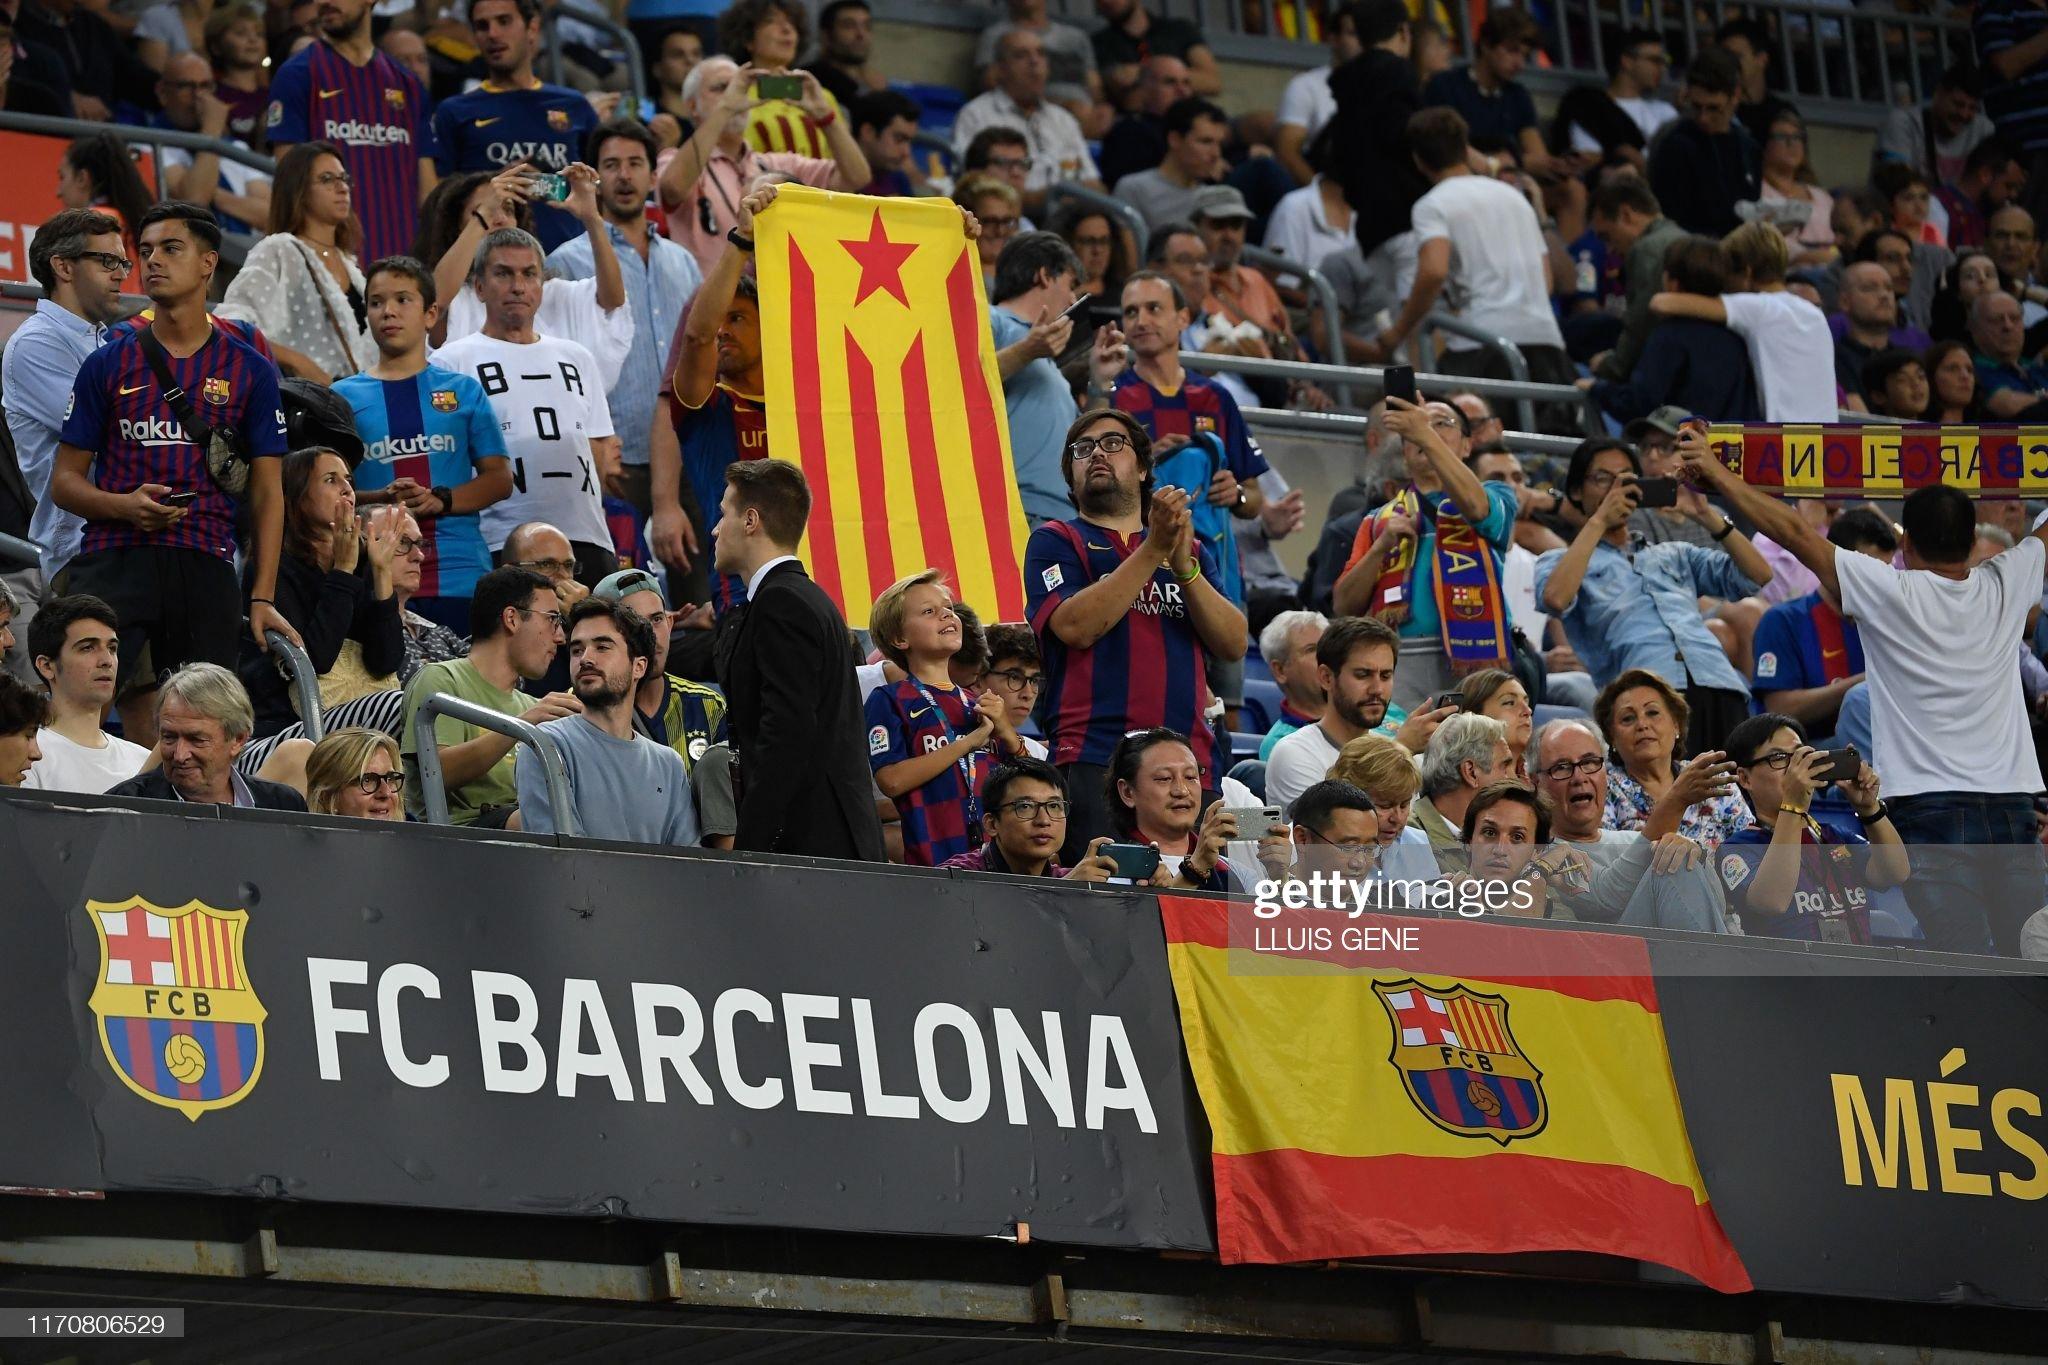 صور مباراة : برشلونة - فياريال 2-1 ( 24-09-2019 )  Barcelonas-fans-hold-a-teams-flag-and-a-catalan-proindependence-flag-picture-id1170806529?s=2048x2048